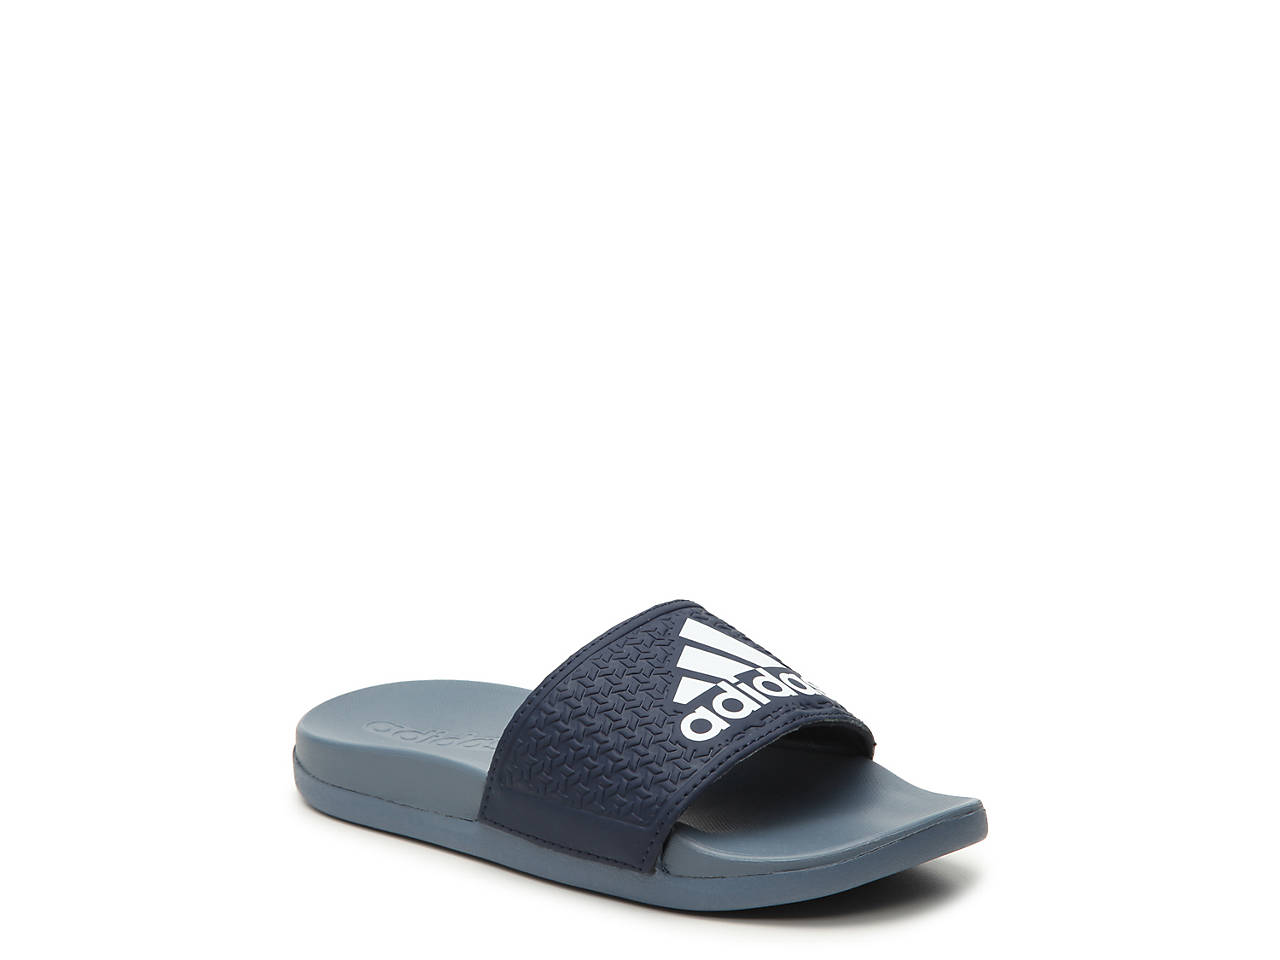 1afac872a9e6 adidas Adilette Cloudfoam Plus Toddler   Youth Slide Sandal Kids ...